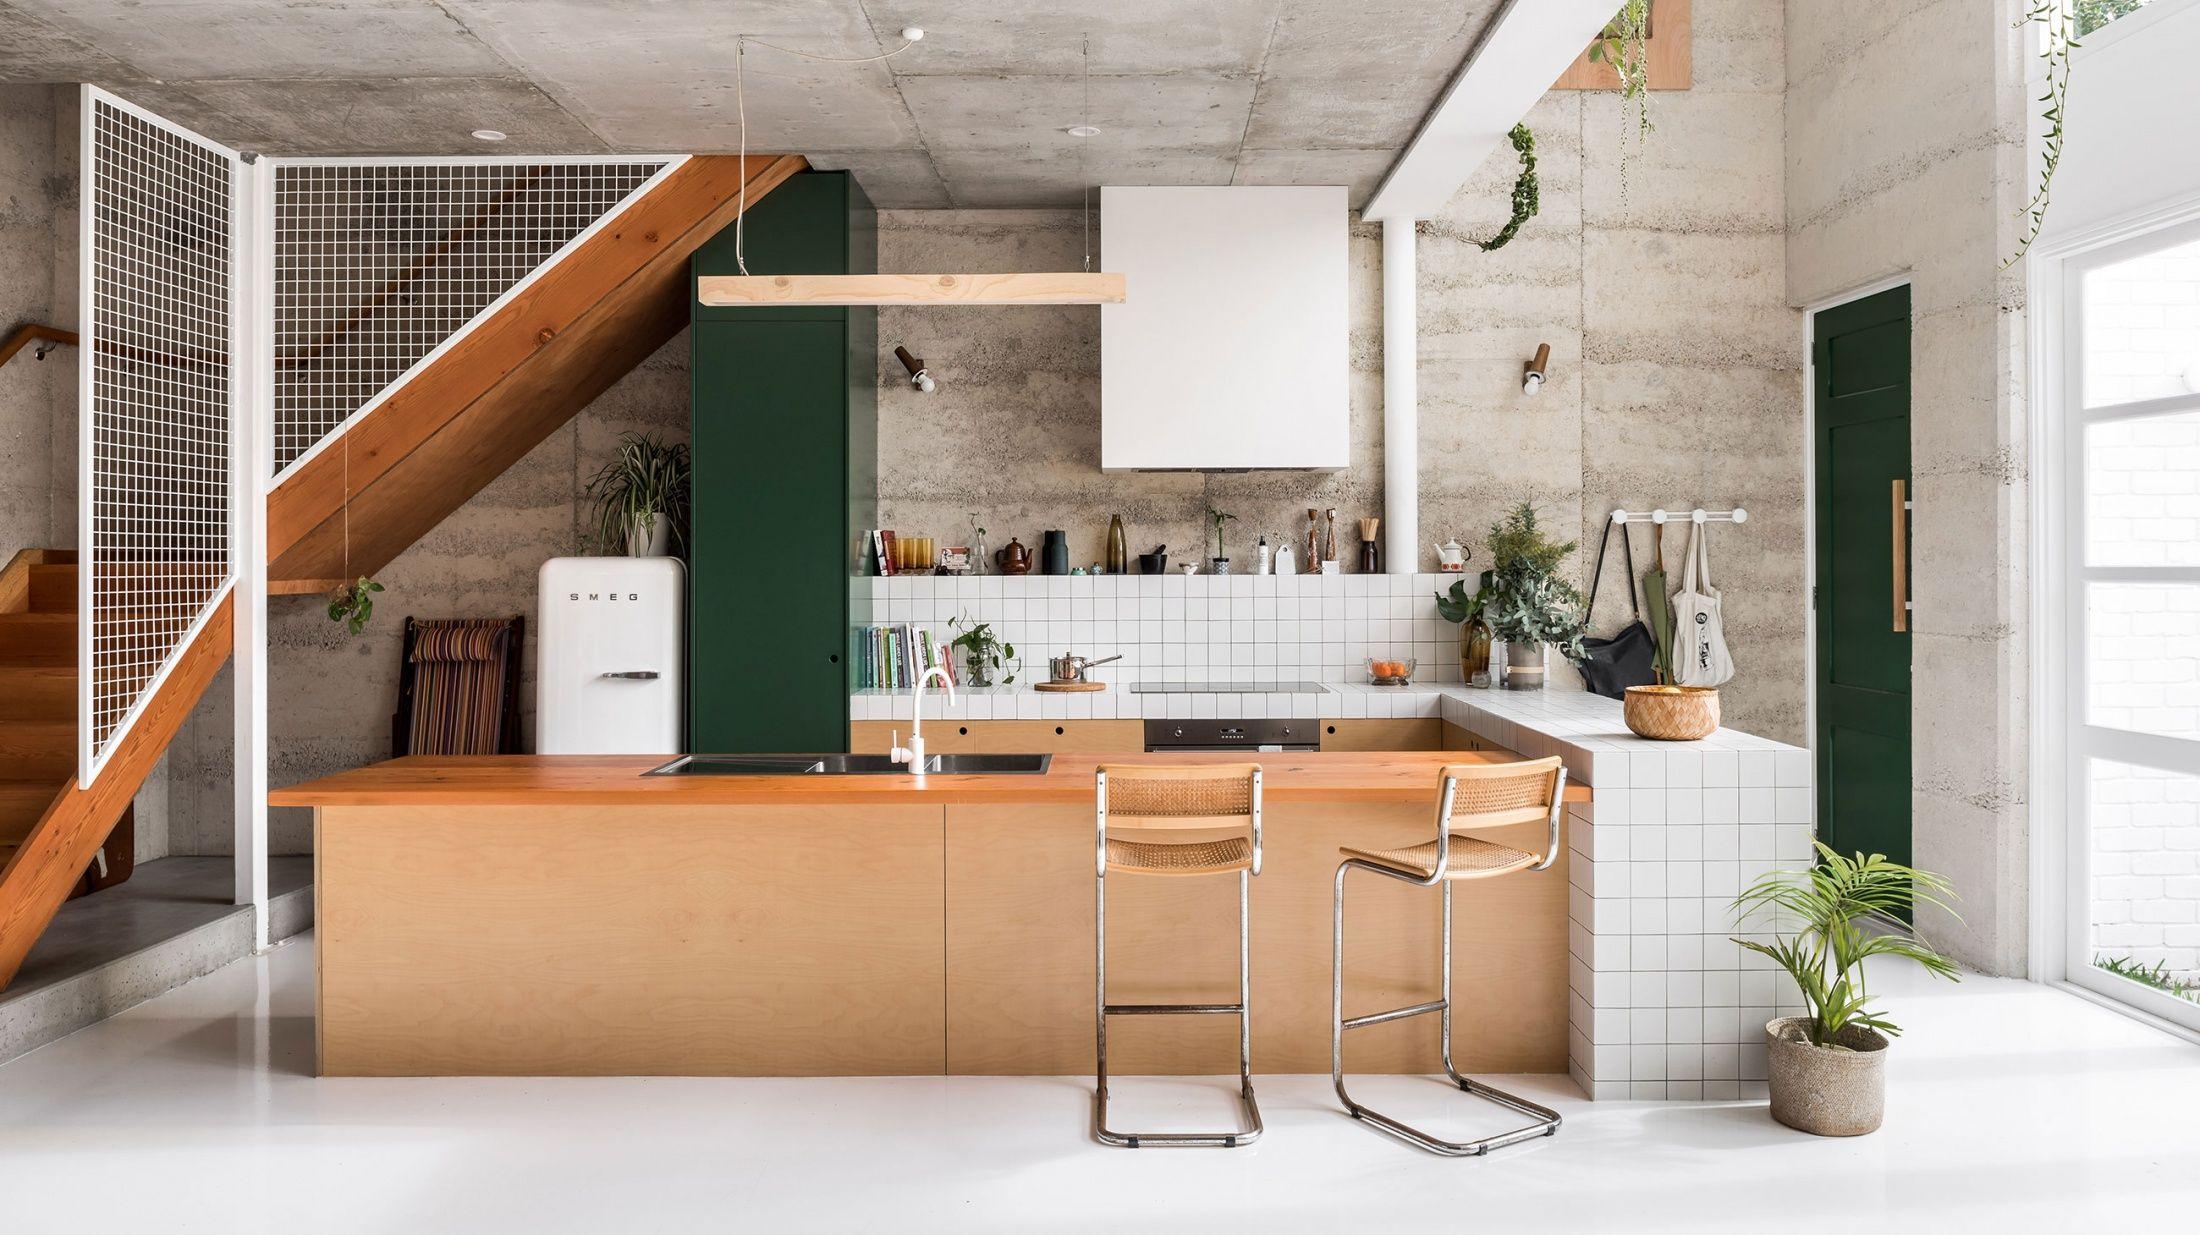 Eco House Western Australia | Hogares australianos, Exótico y Industrial